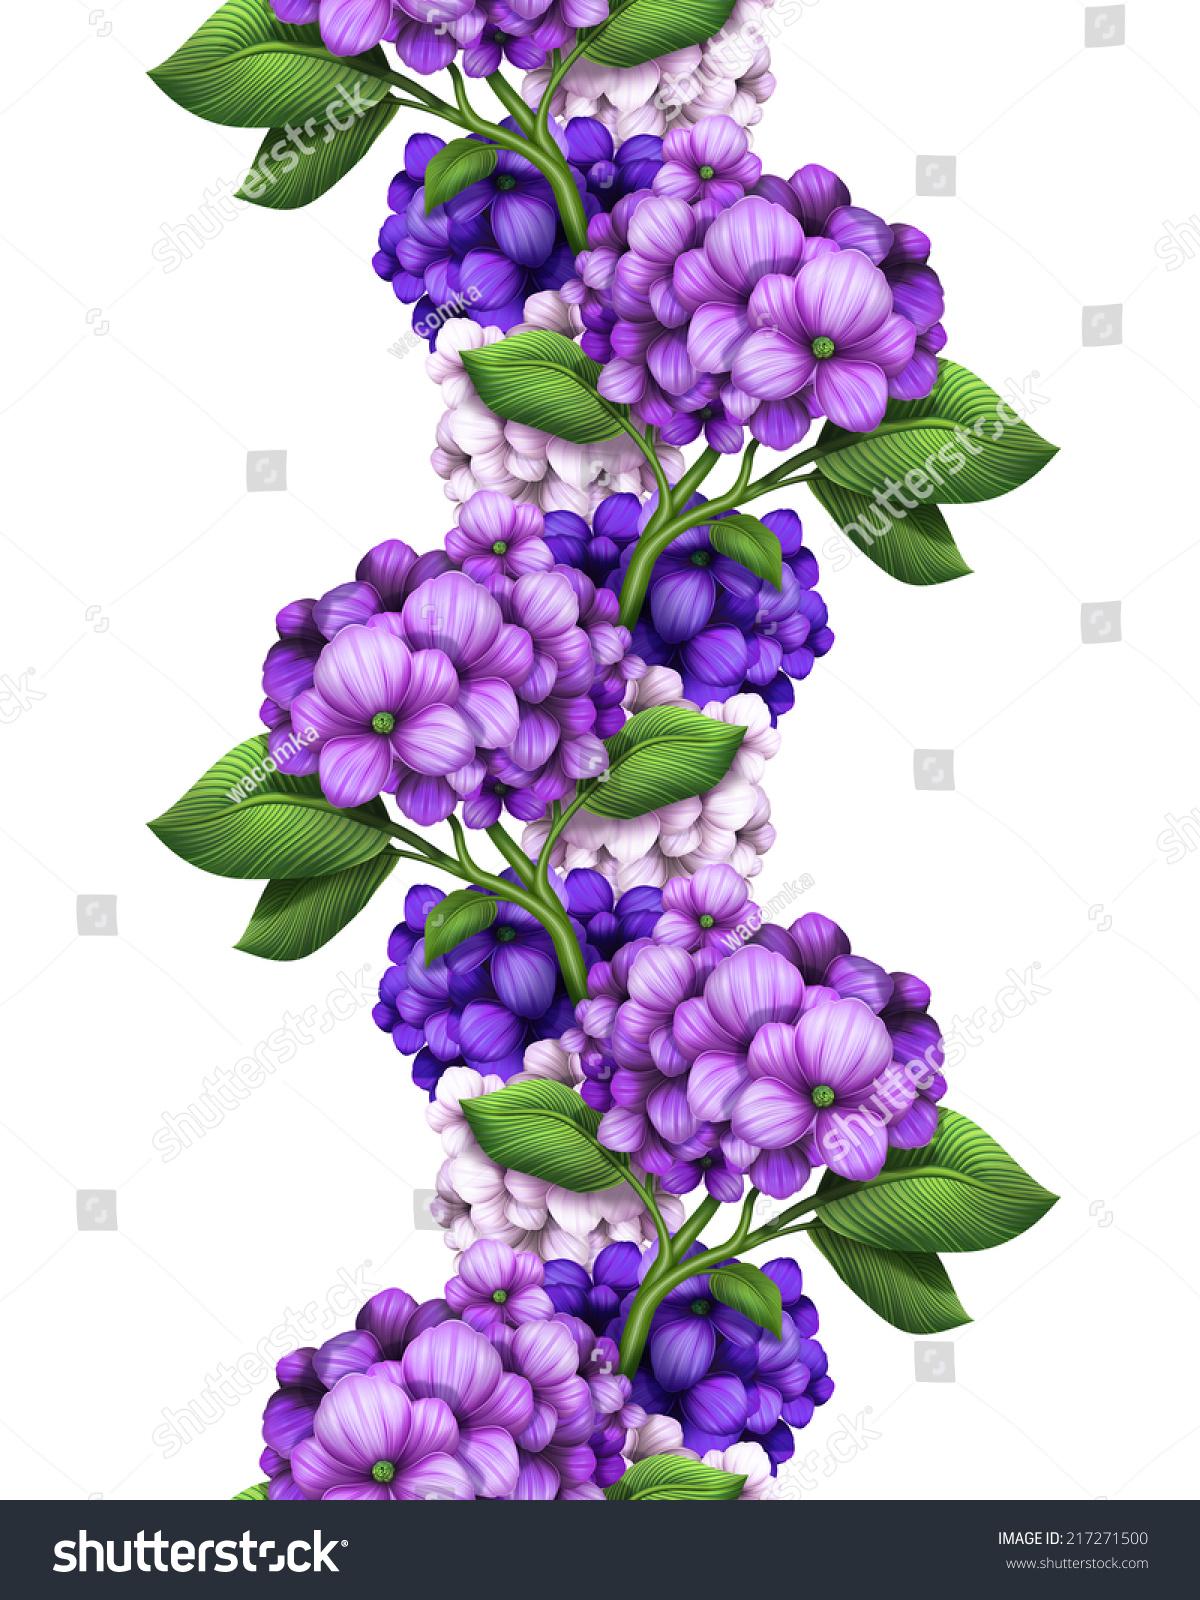 Abstract Purple Hydrangea Vertical Garland Seamless Stock